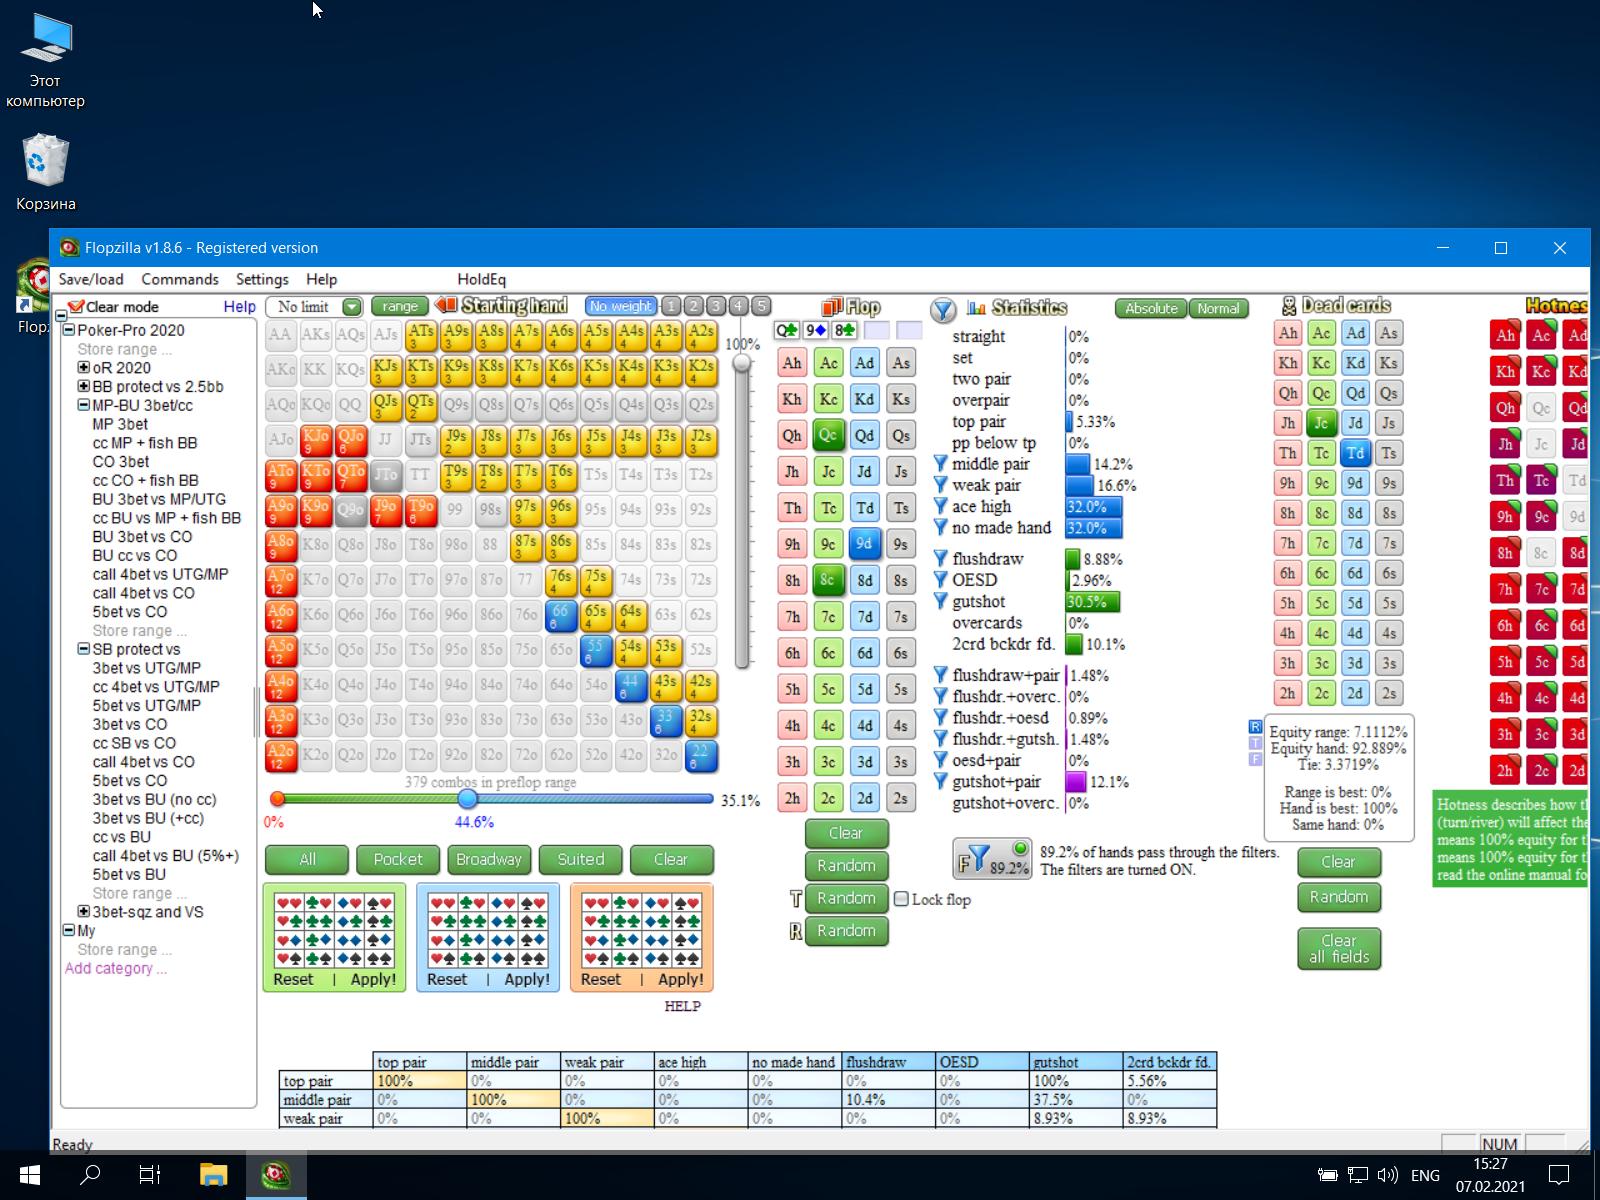 virtualboxwin-10070220211531381612701121.png